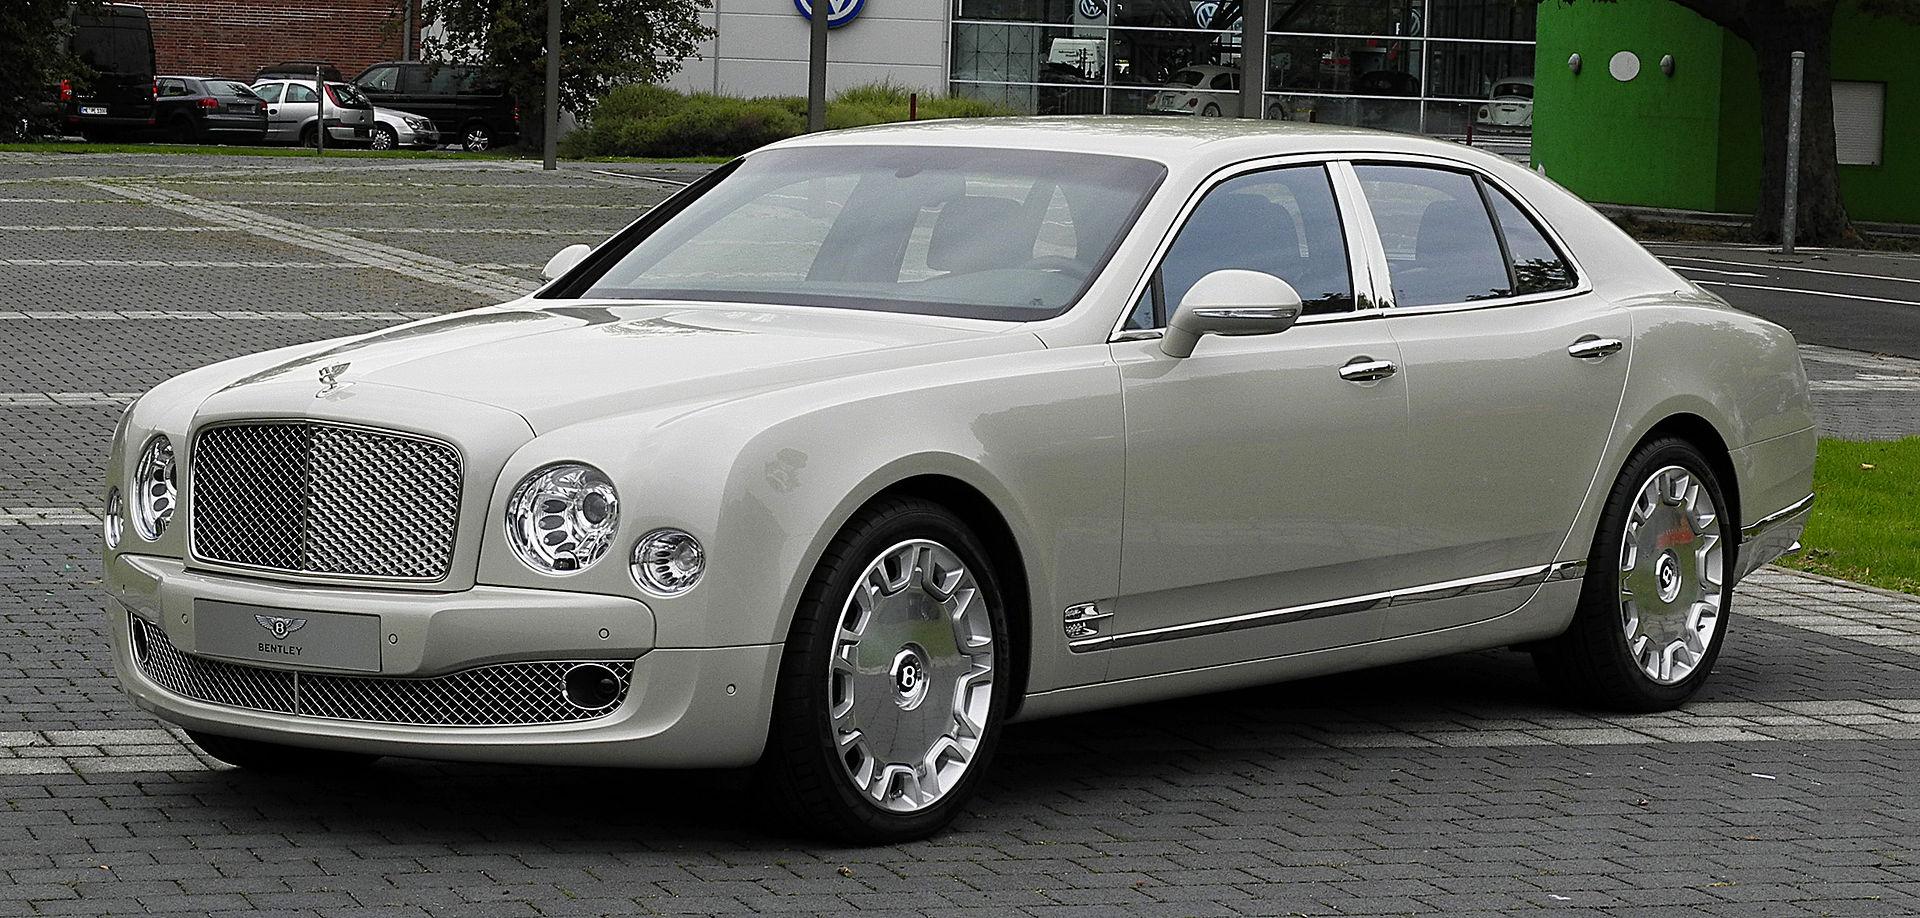 The Bentley Mulsanne S Very Limited: Bentley Mulsanne (2010)